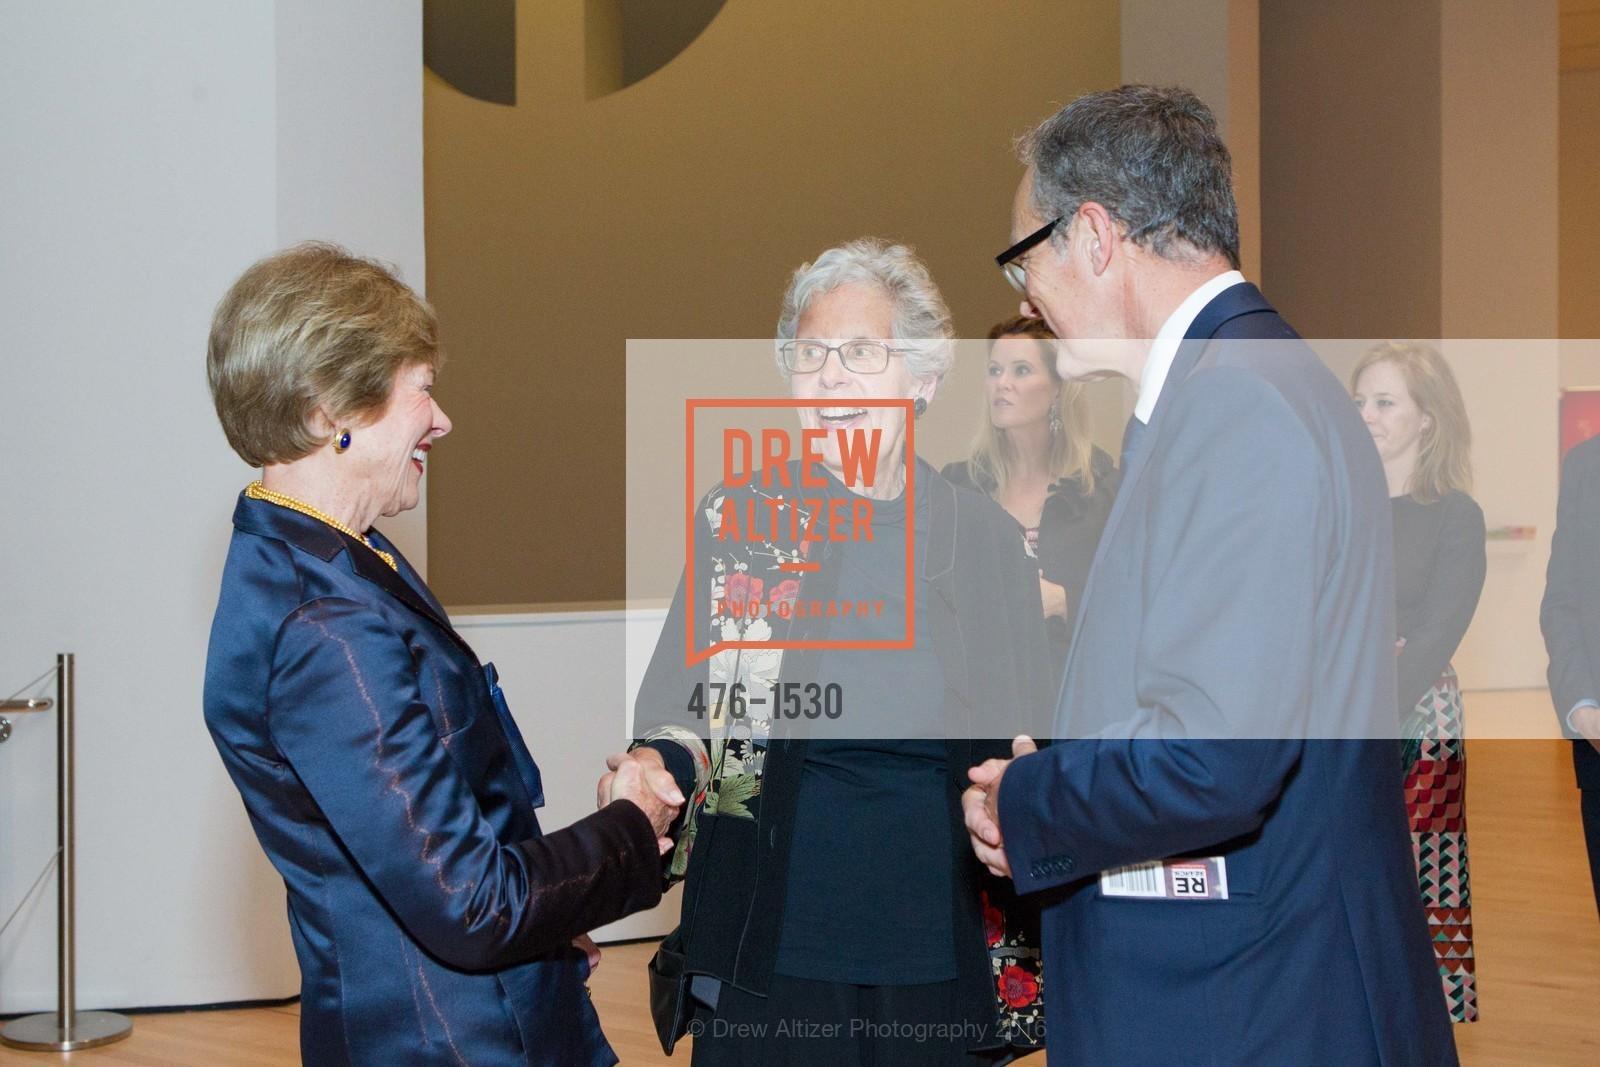 Pam Kramlich, Jean Conner, Rudolf Frieling, Photo #476-1530